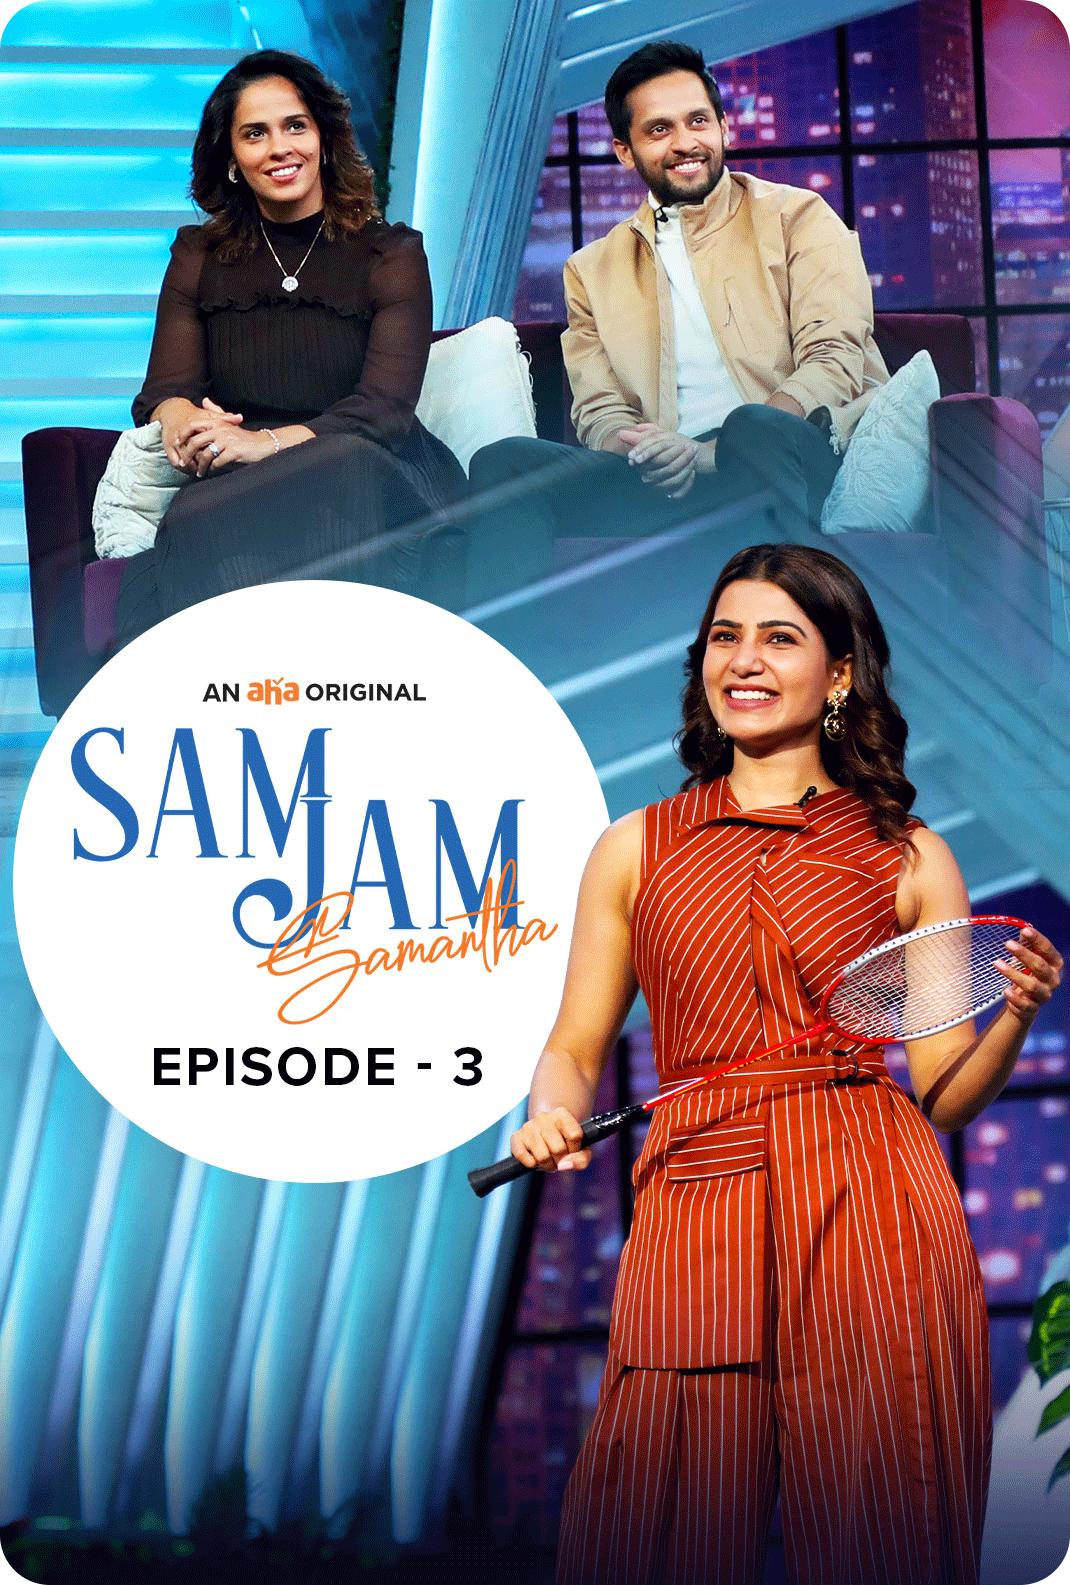 Sam Jam Season 1 Episode 3